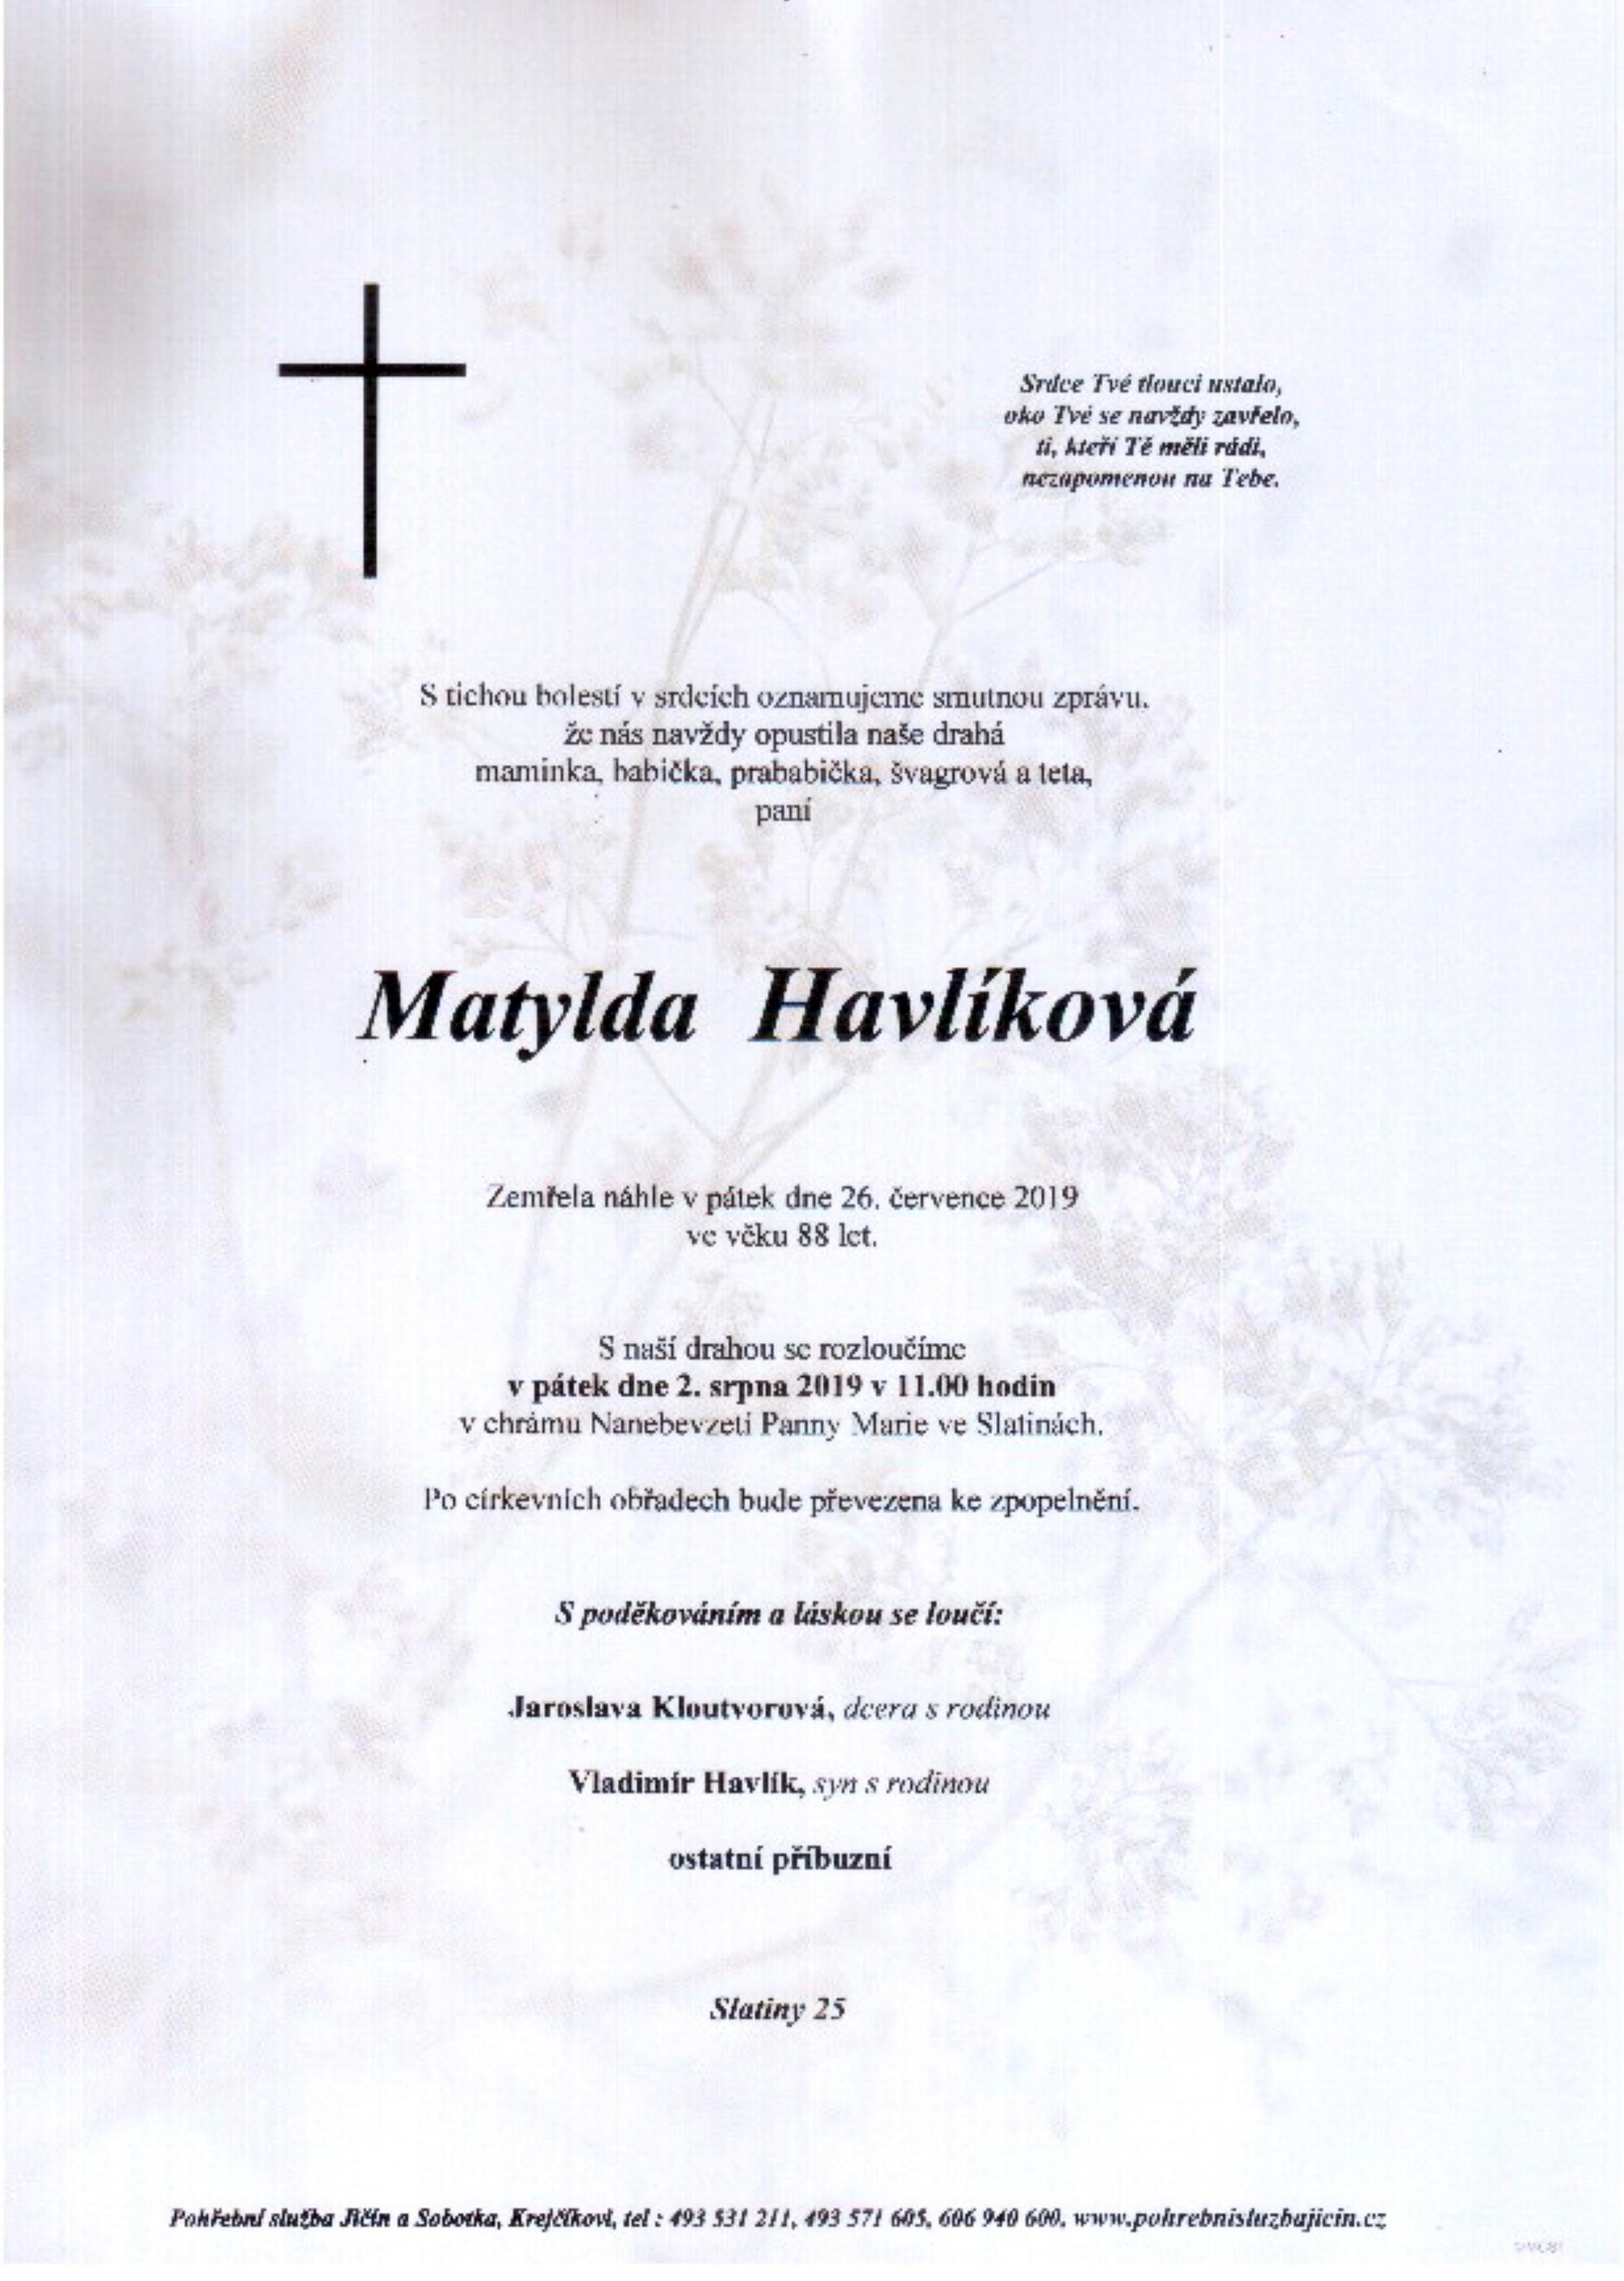 Matylda Havlíková